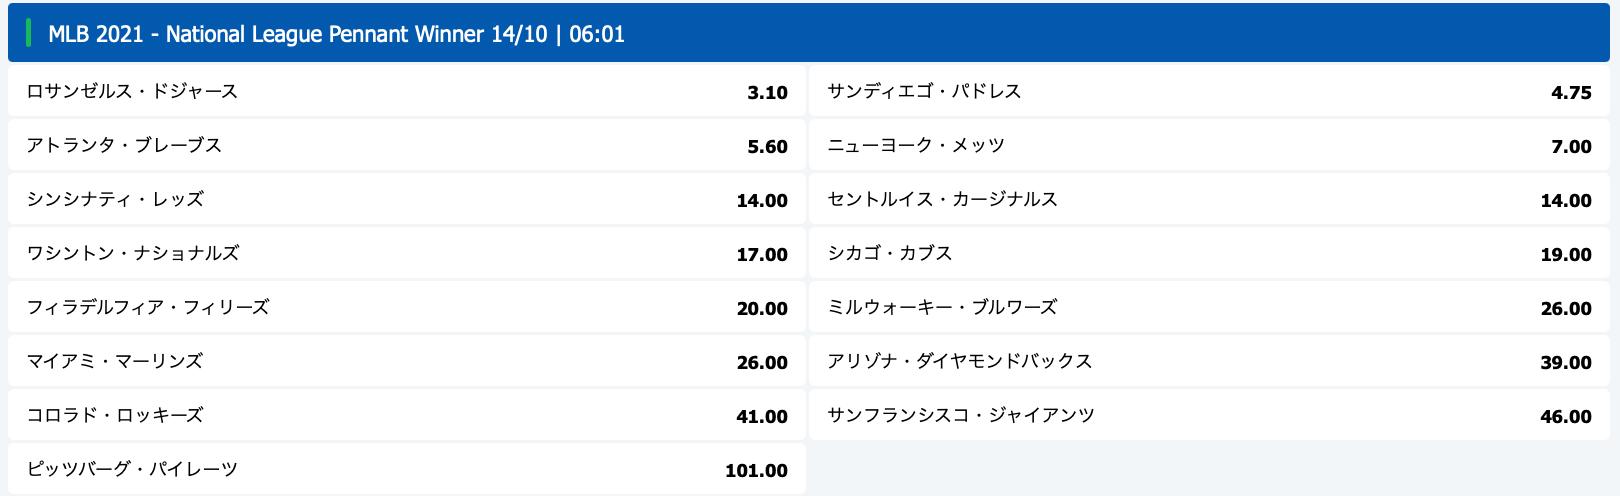 mlb2021ナ・リーグ優勝予想オッズ